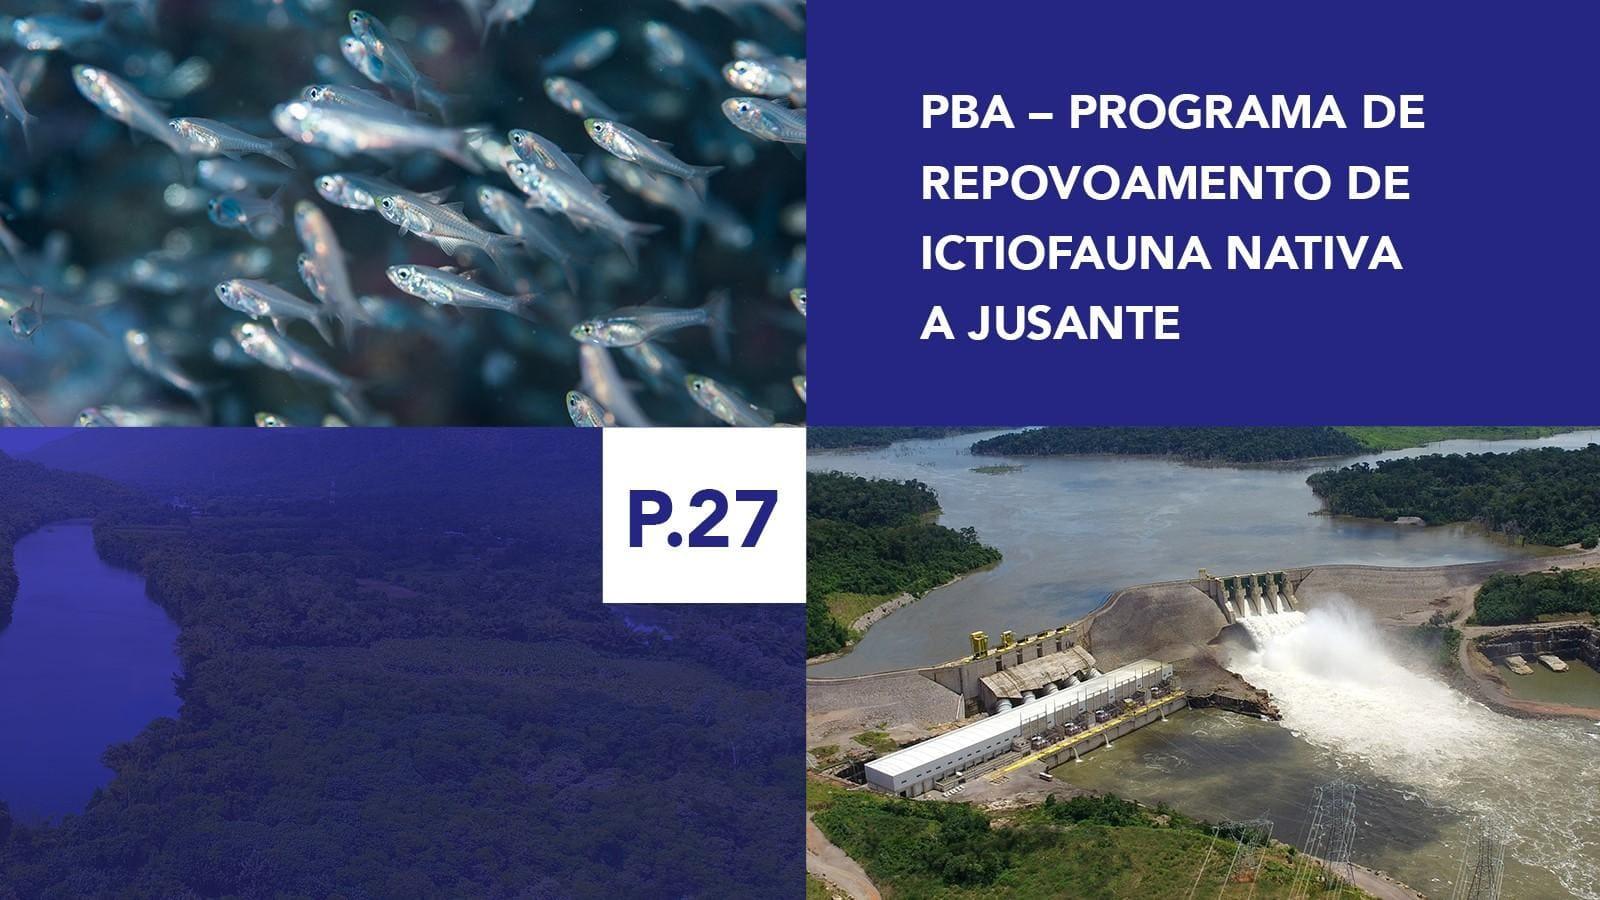 P.27 - Programa de Repovoamento de Ictiofauna Nativa a Jusante